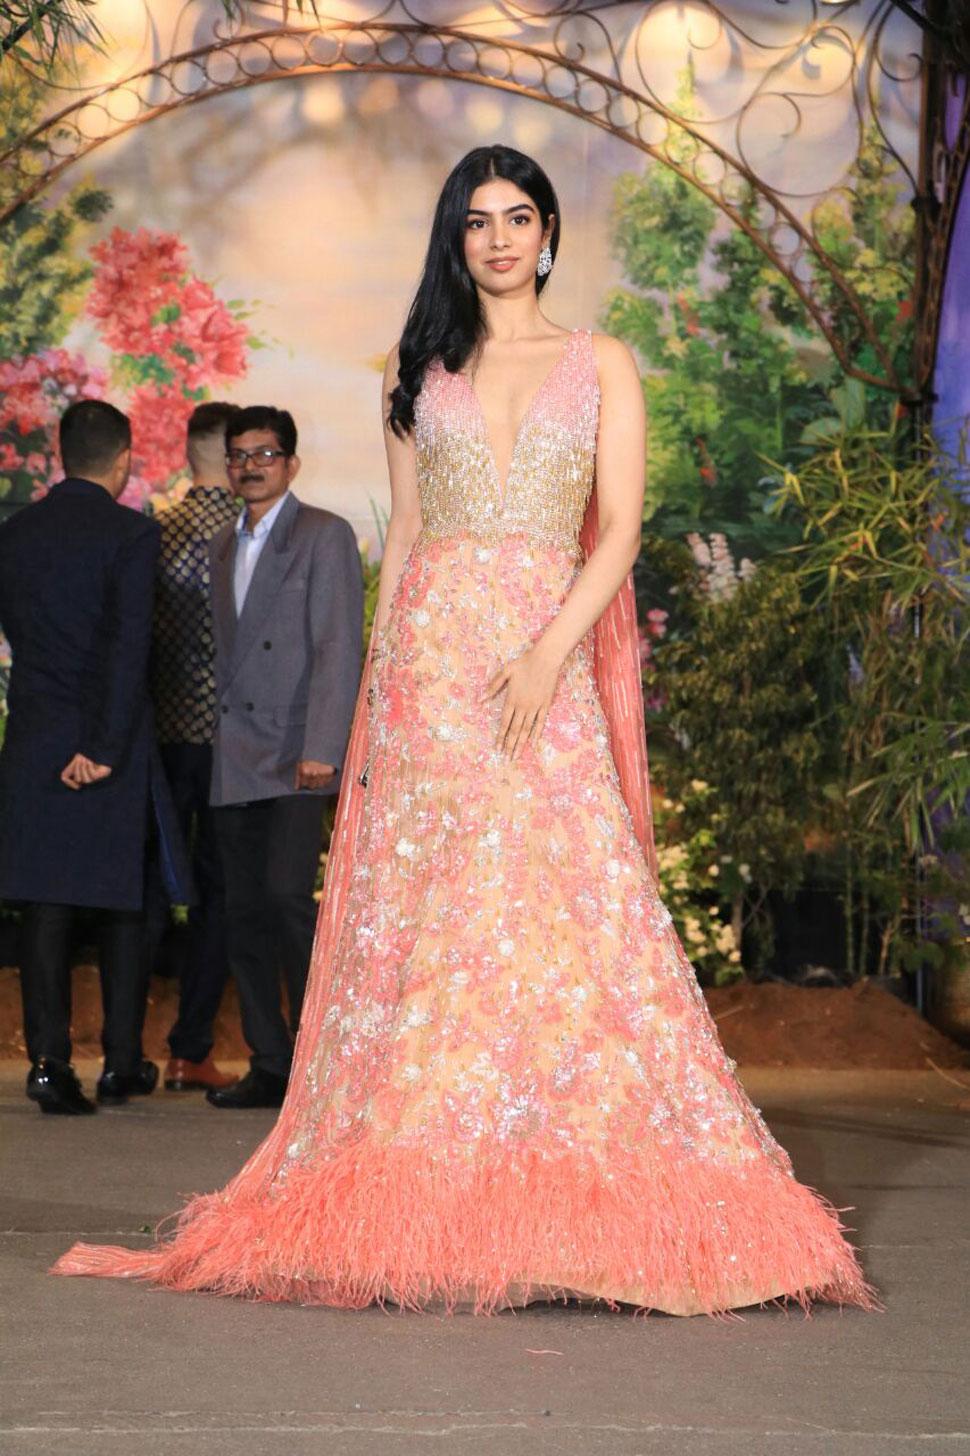 Sonam Kapoor Reception, Jhanvi Kapoor, Arjun Kapoor, Khushi Kapoor, Anshula Kapoor, Boney kapoor